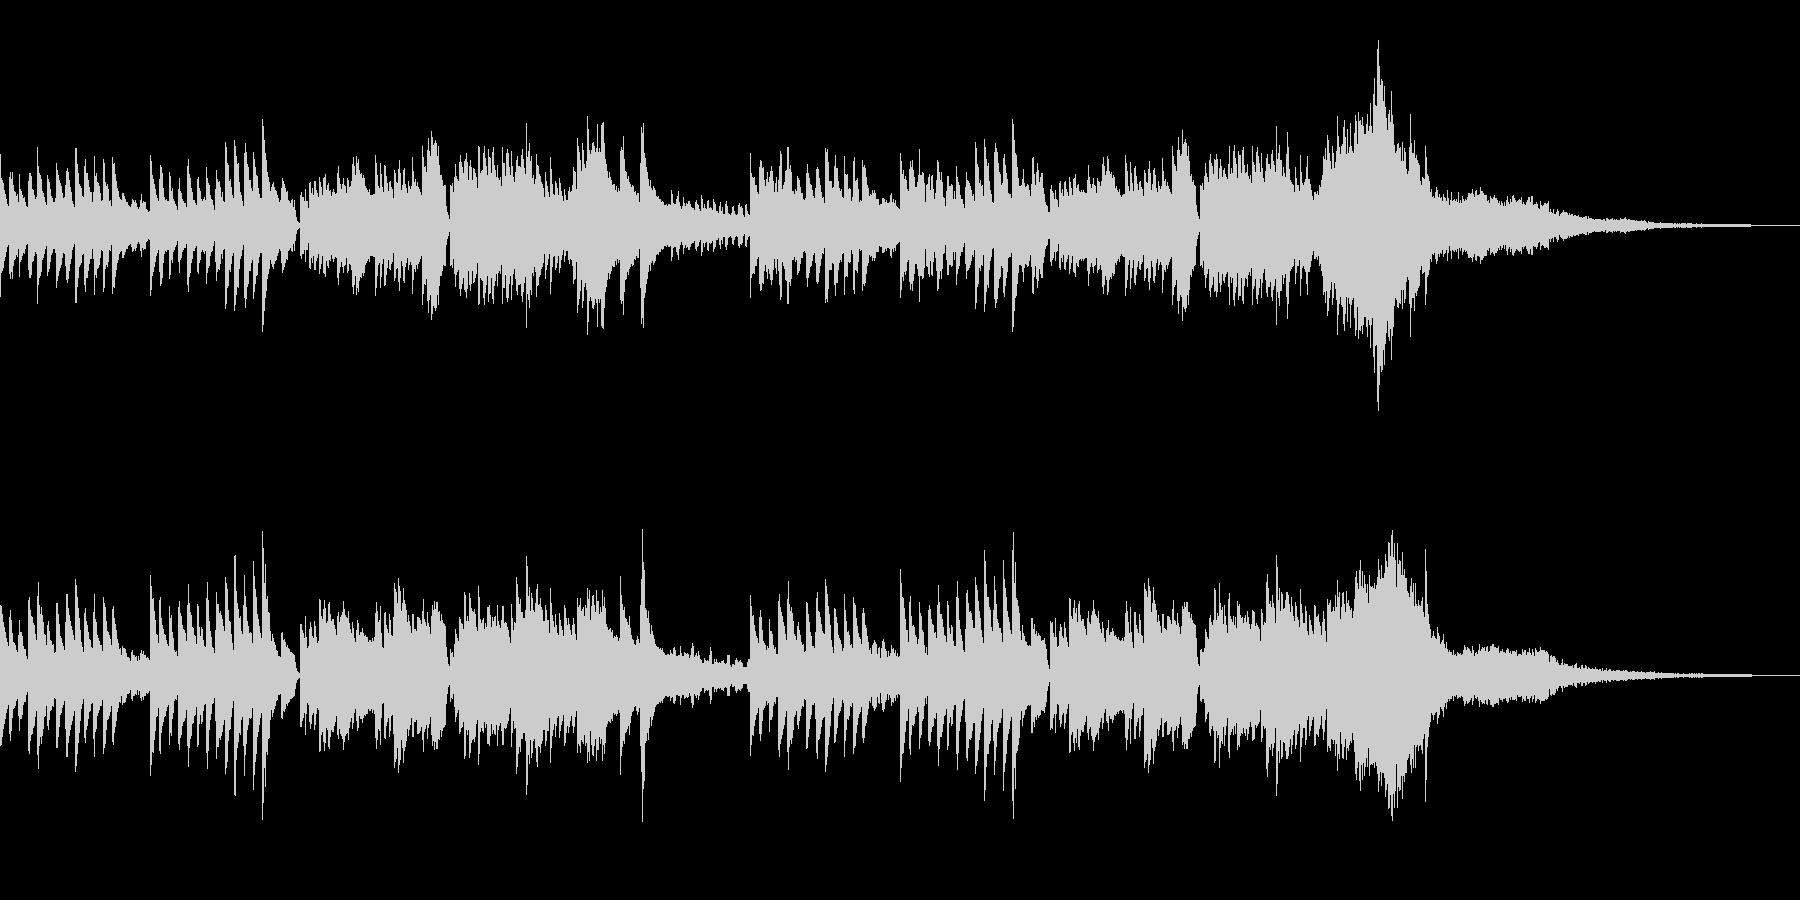 CM 和風 ピアノとフルート 映像などにの未再生の波形